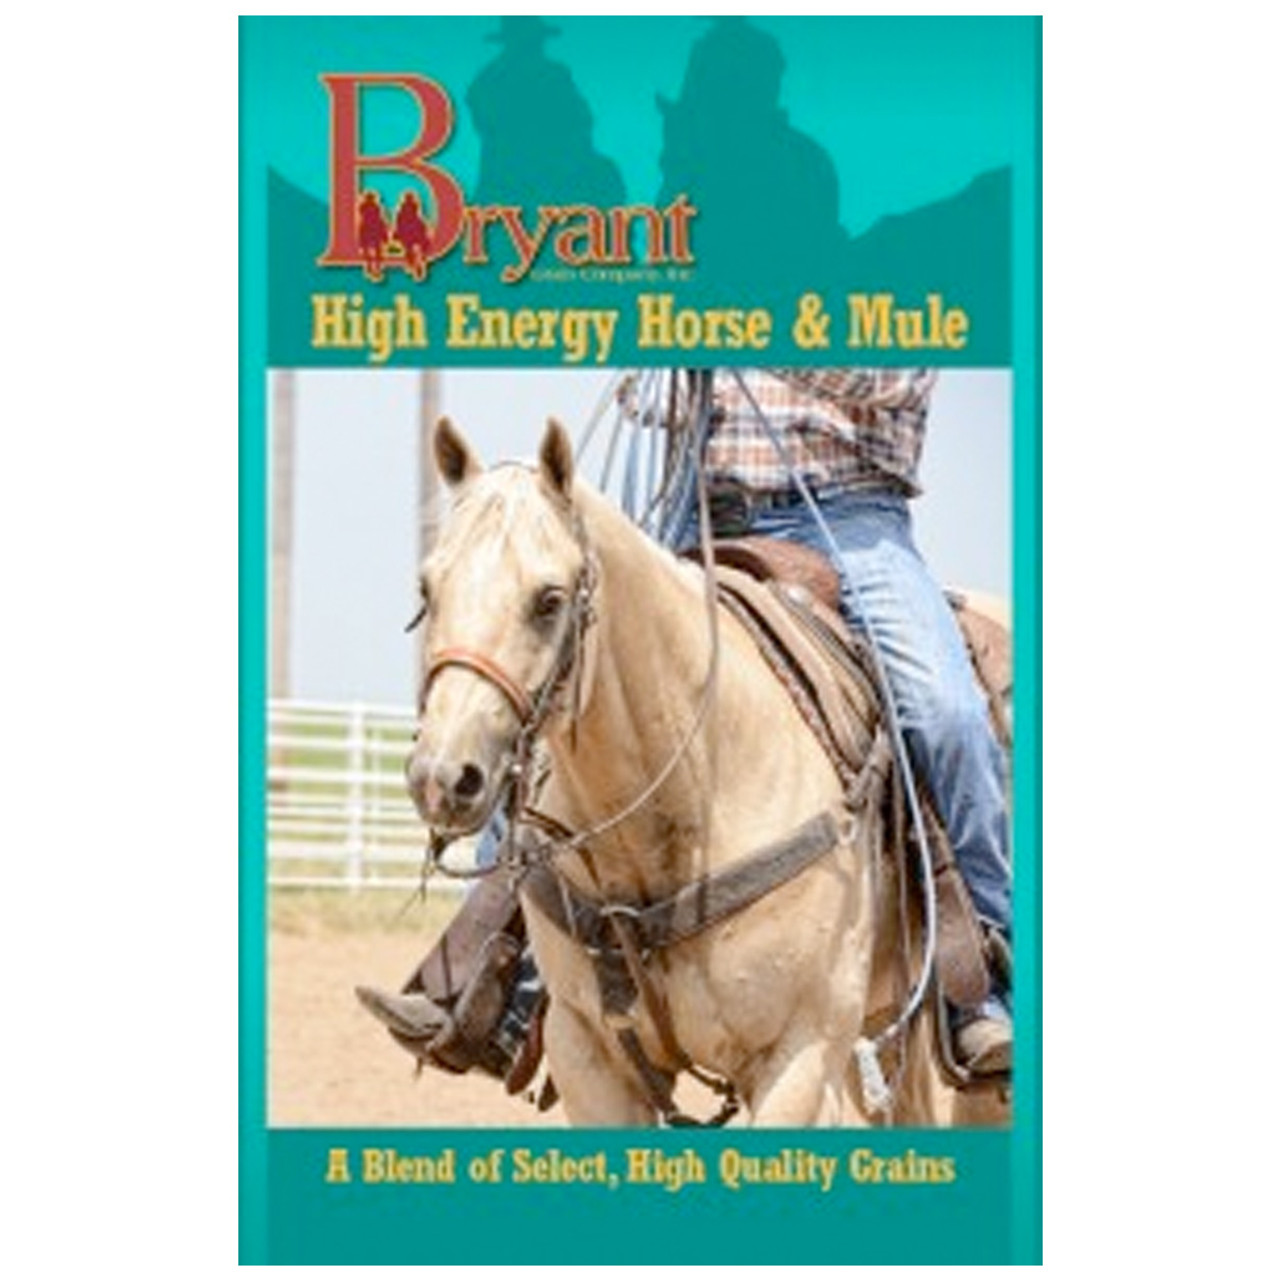 High Energy Horse & Mule